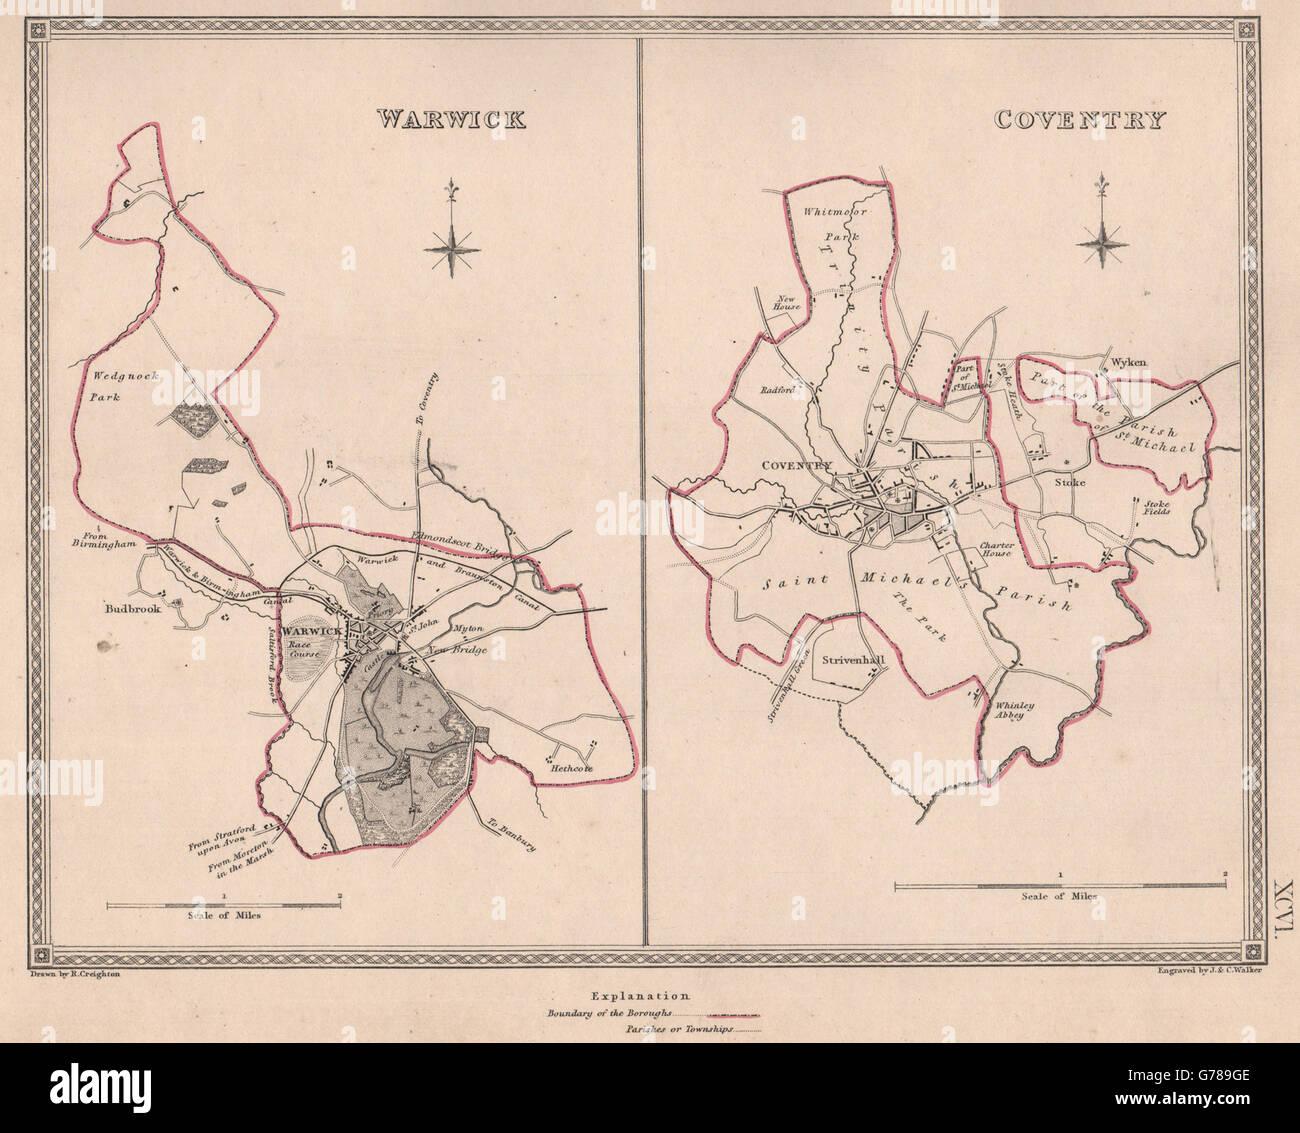 CREIGHTON//WALKER 1835 map WARWICKSHIRE TOWNS Warwick Coventry borough plans